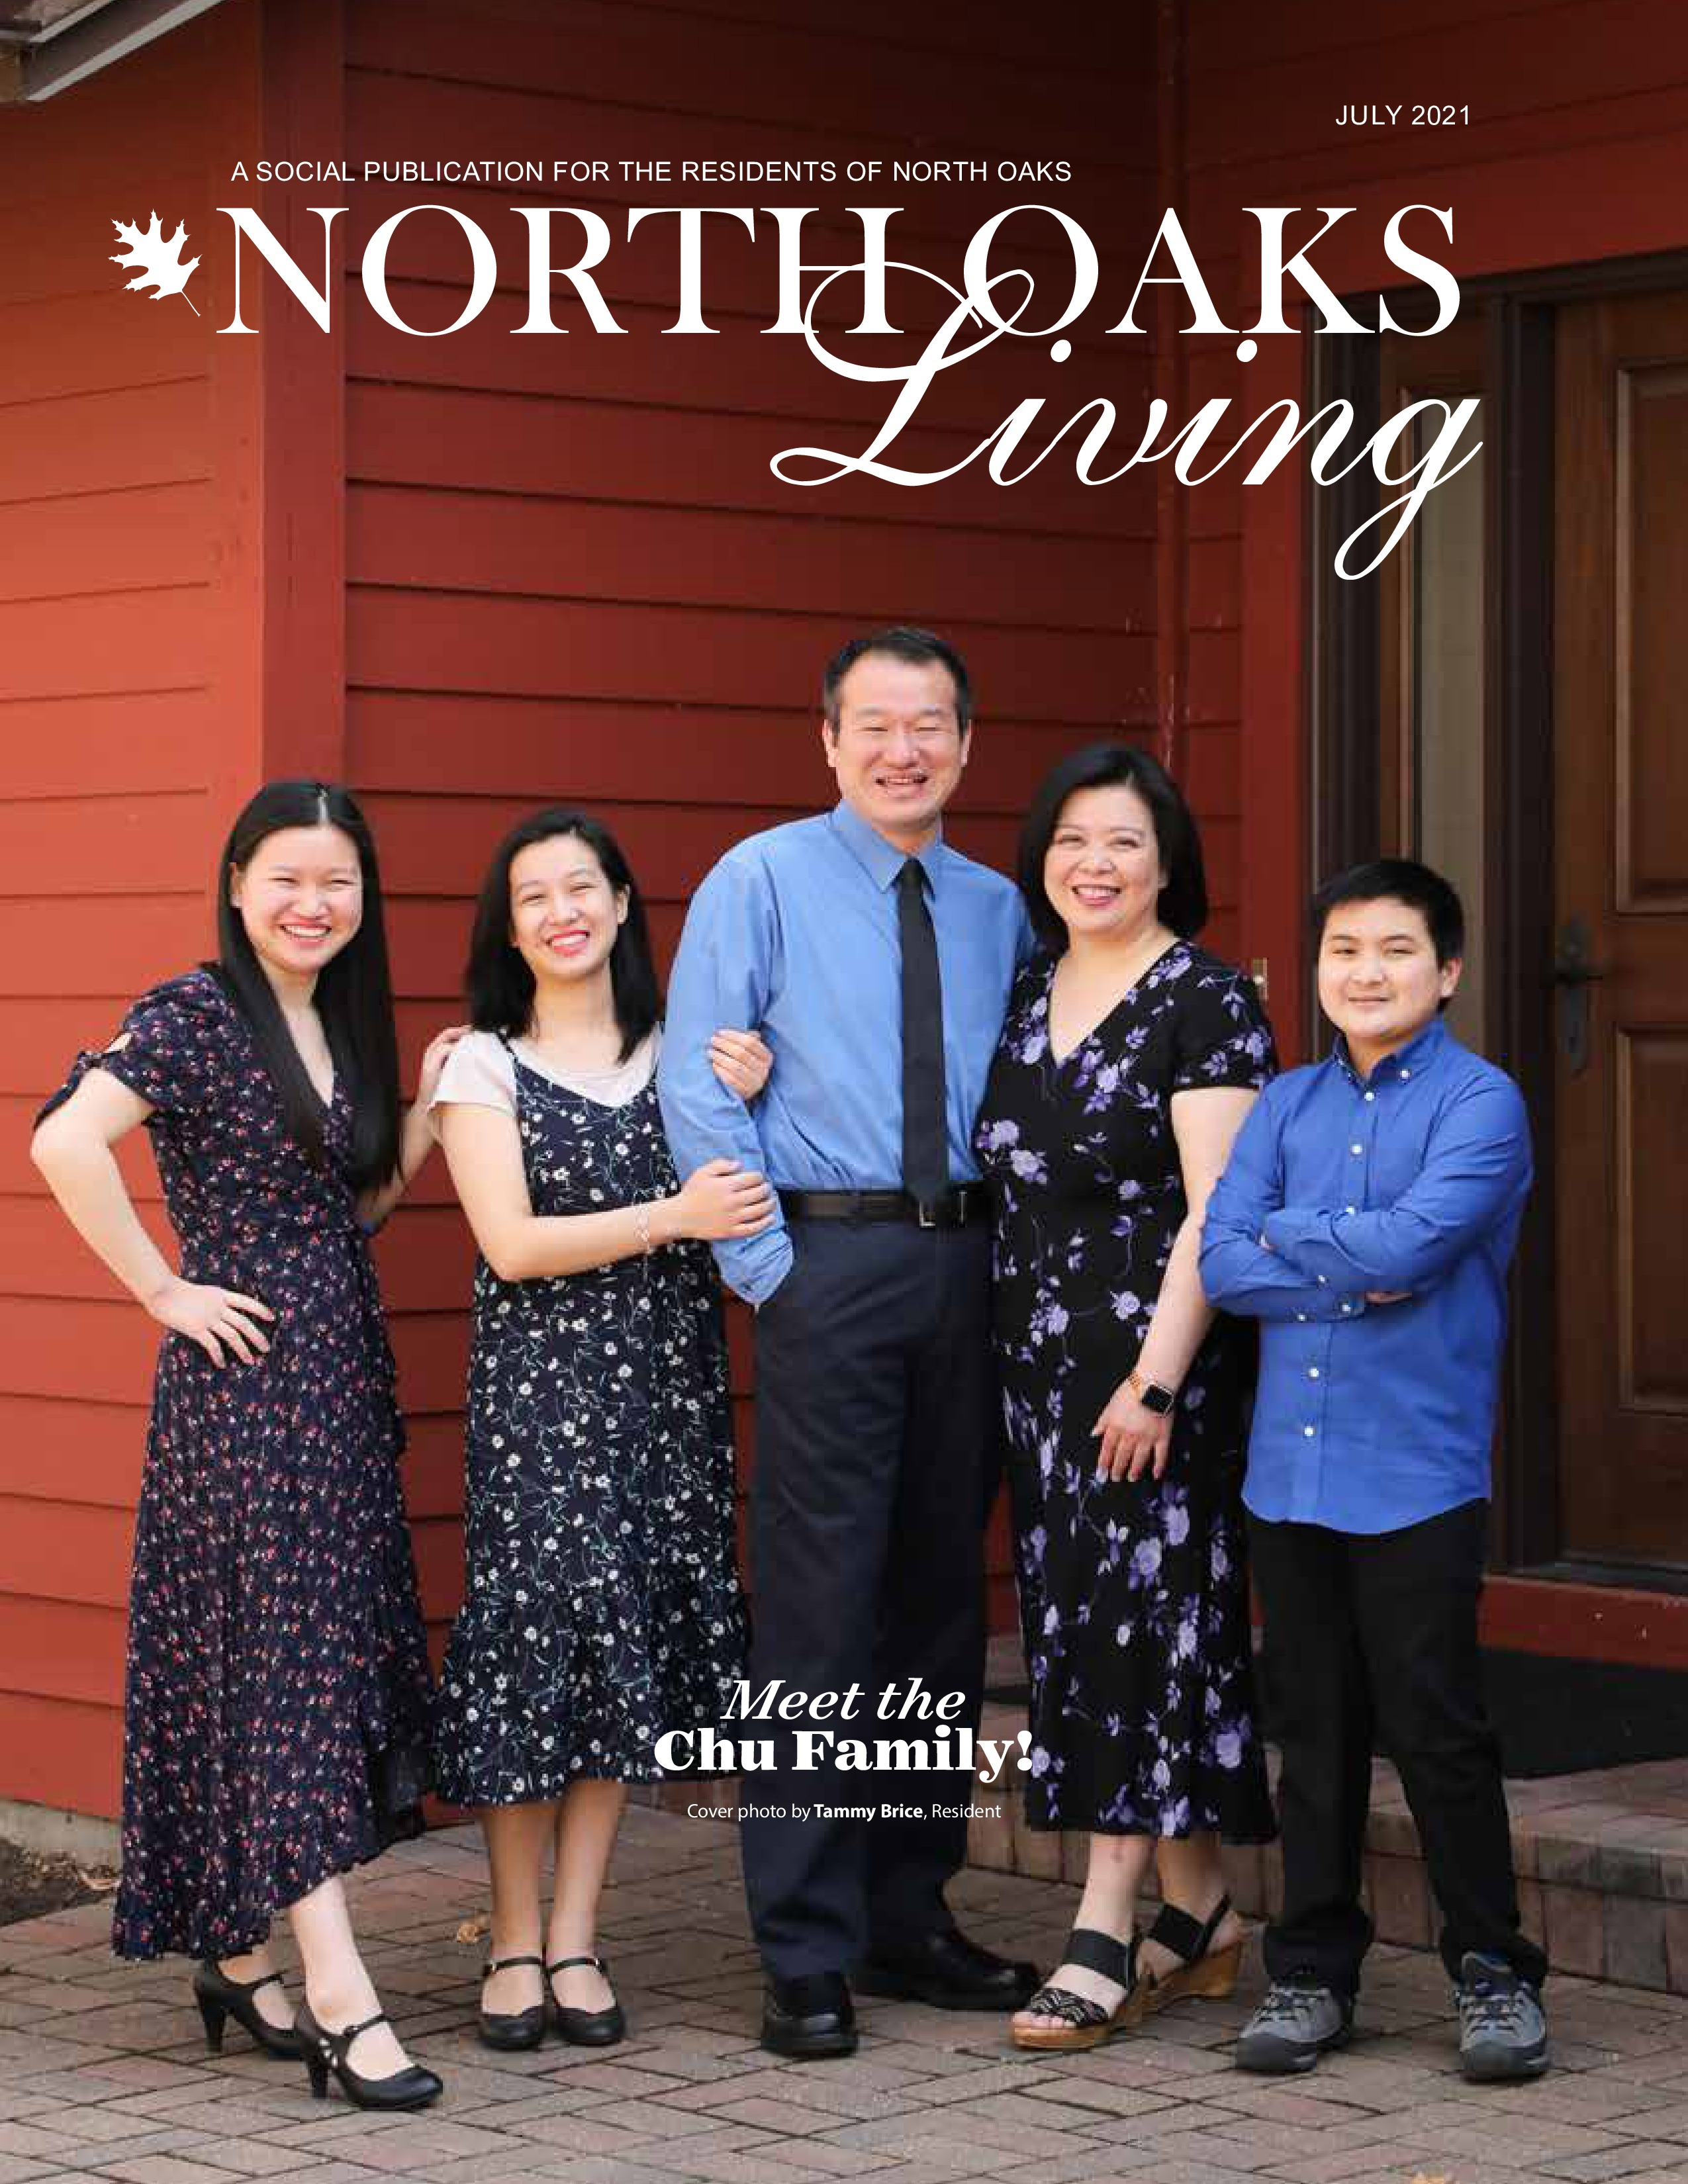 North Oaks Living 2021-07-01